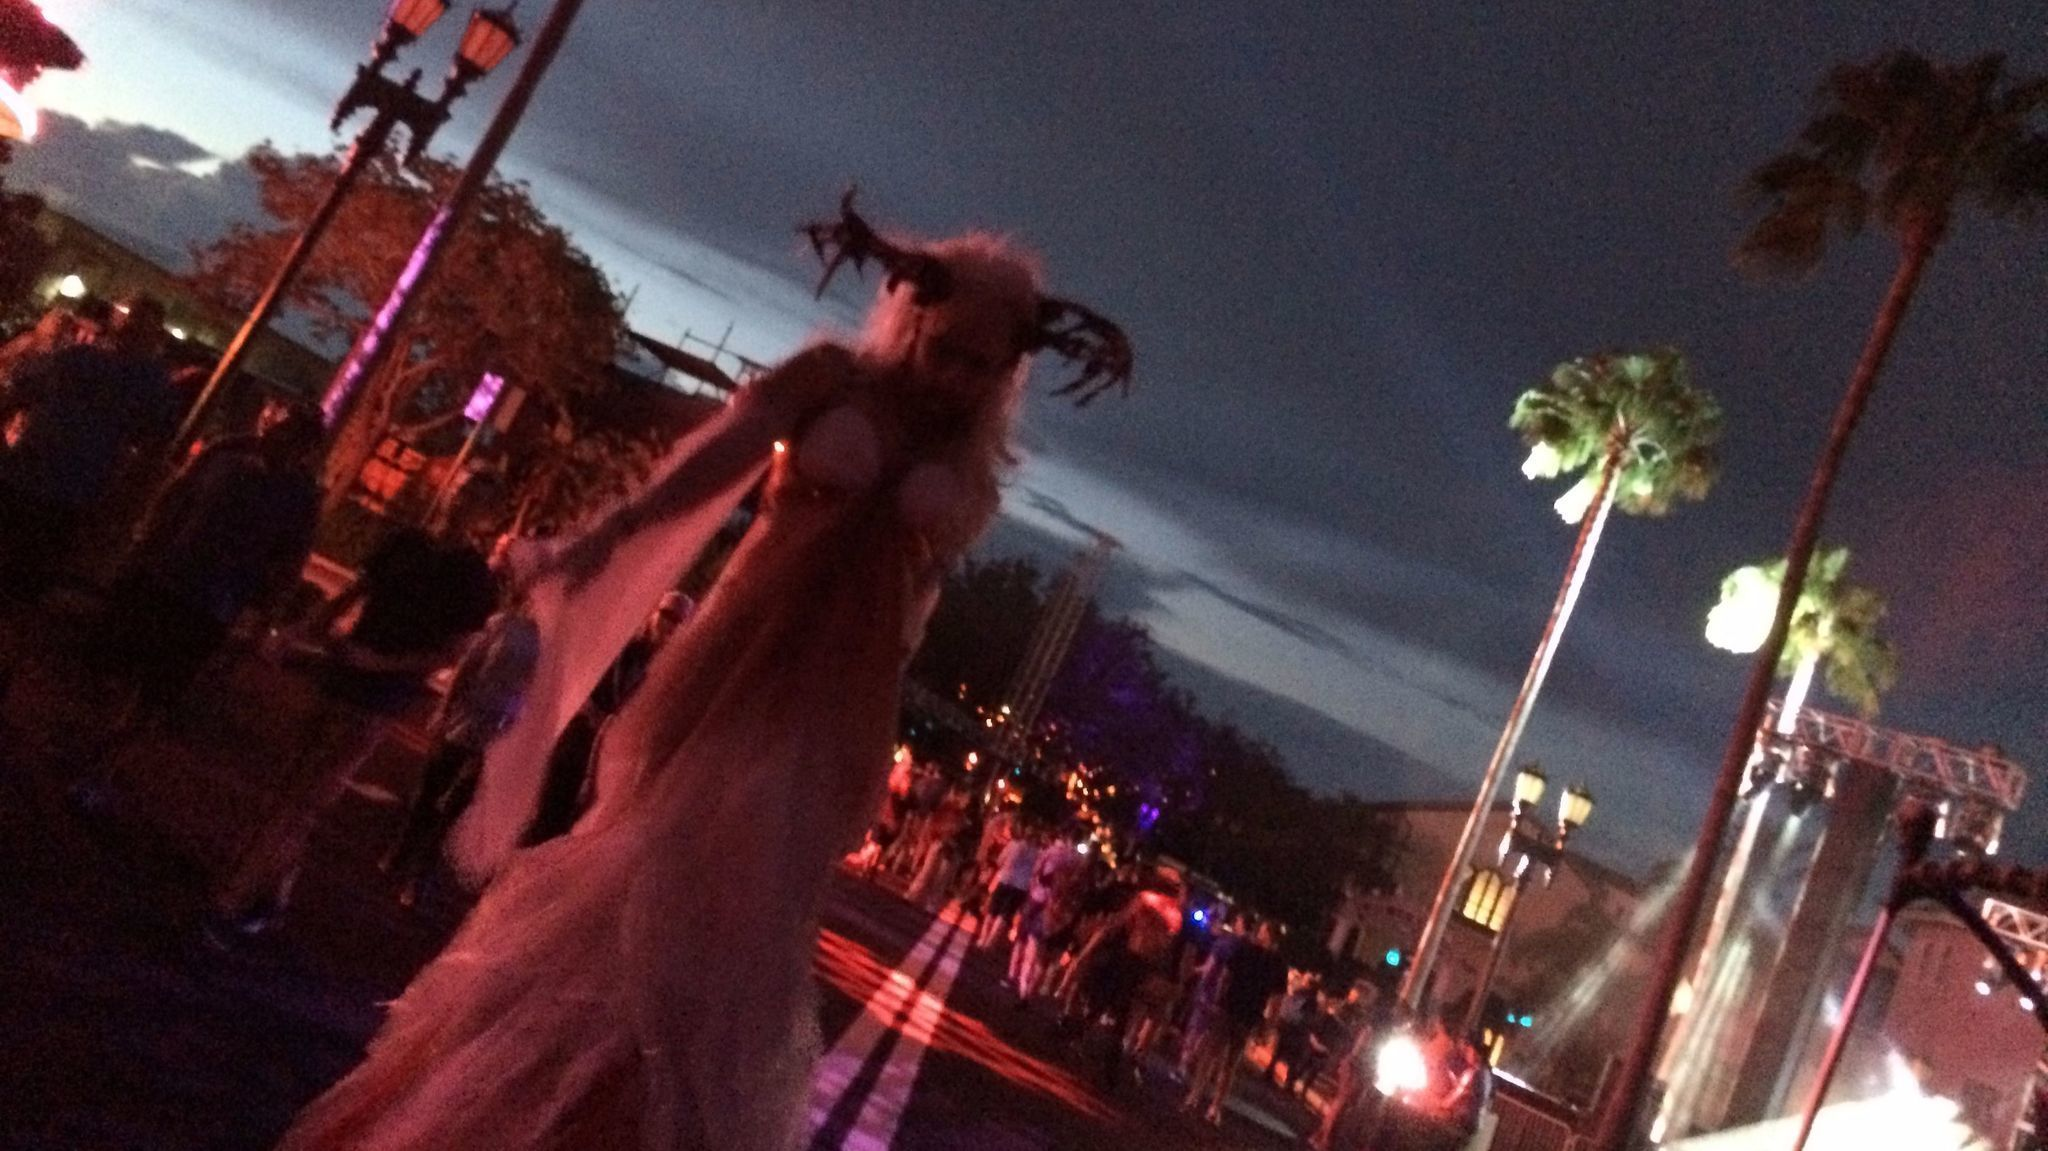 Bk Halloween Horror Nights Promo Code | What S The Scariest Thing At Halloween Horror Nights Orlando Sentinel